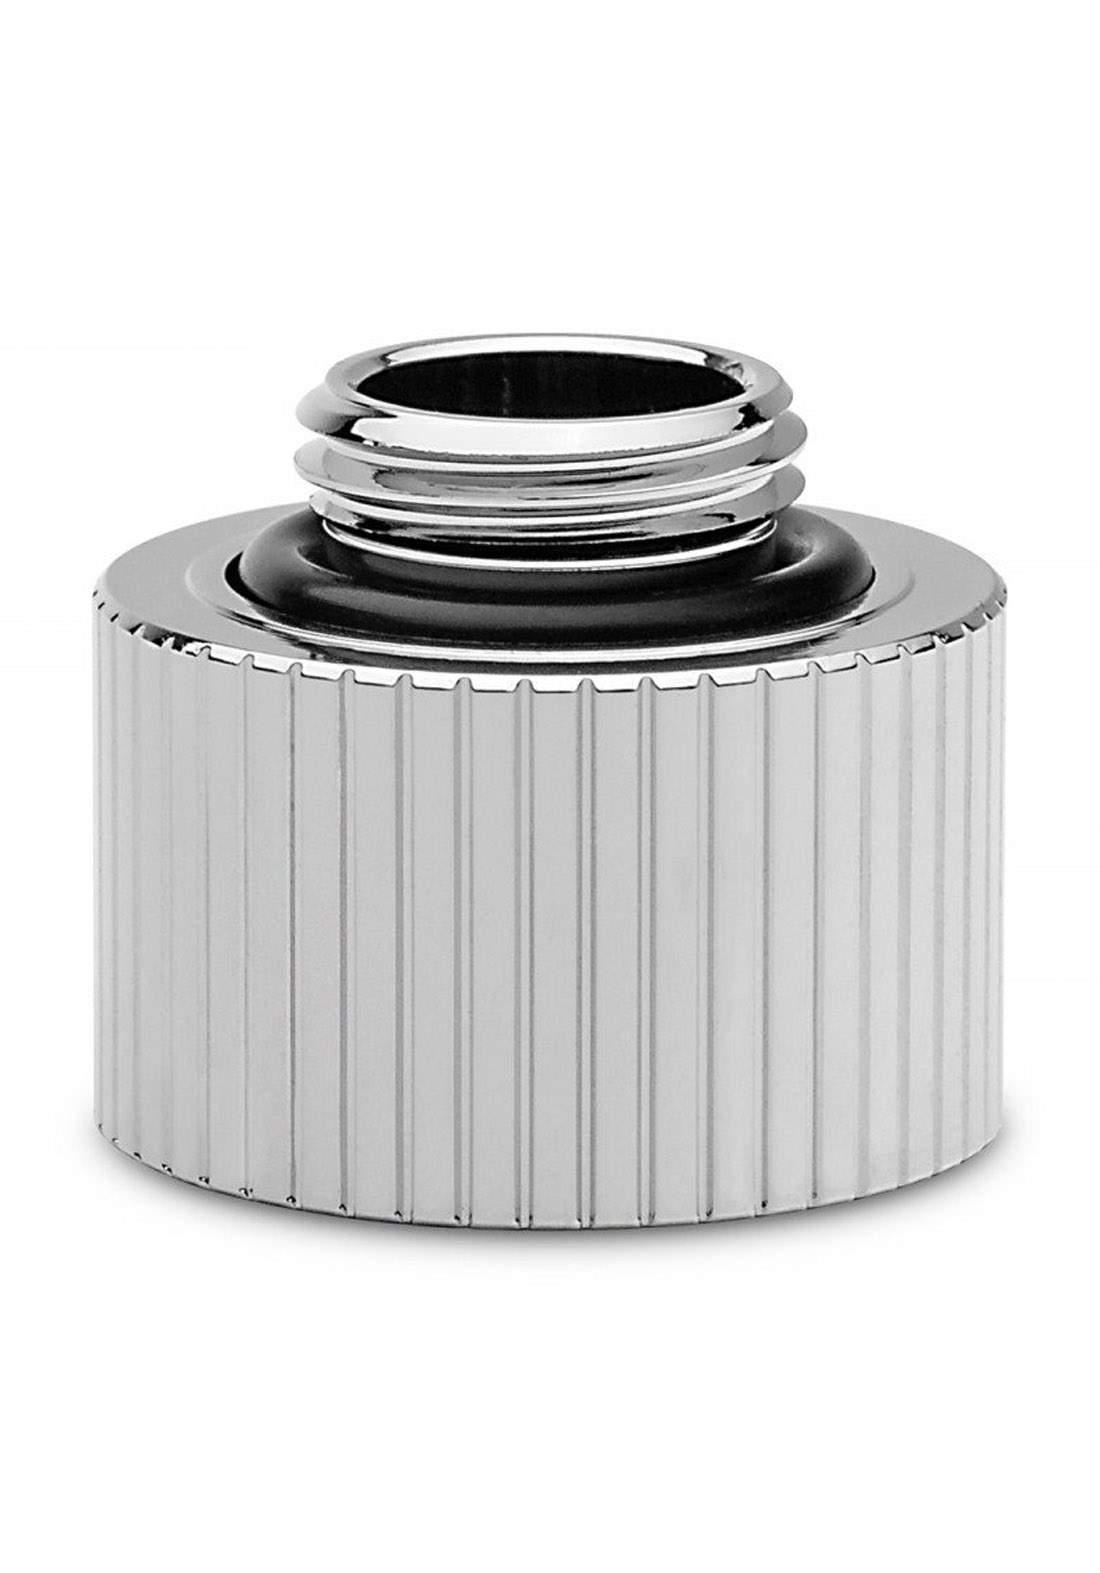 EK-Quantum Torque Extender Static MF 14 - Nickel